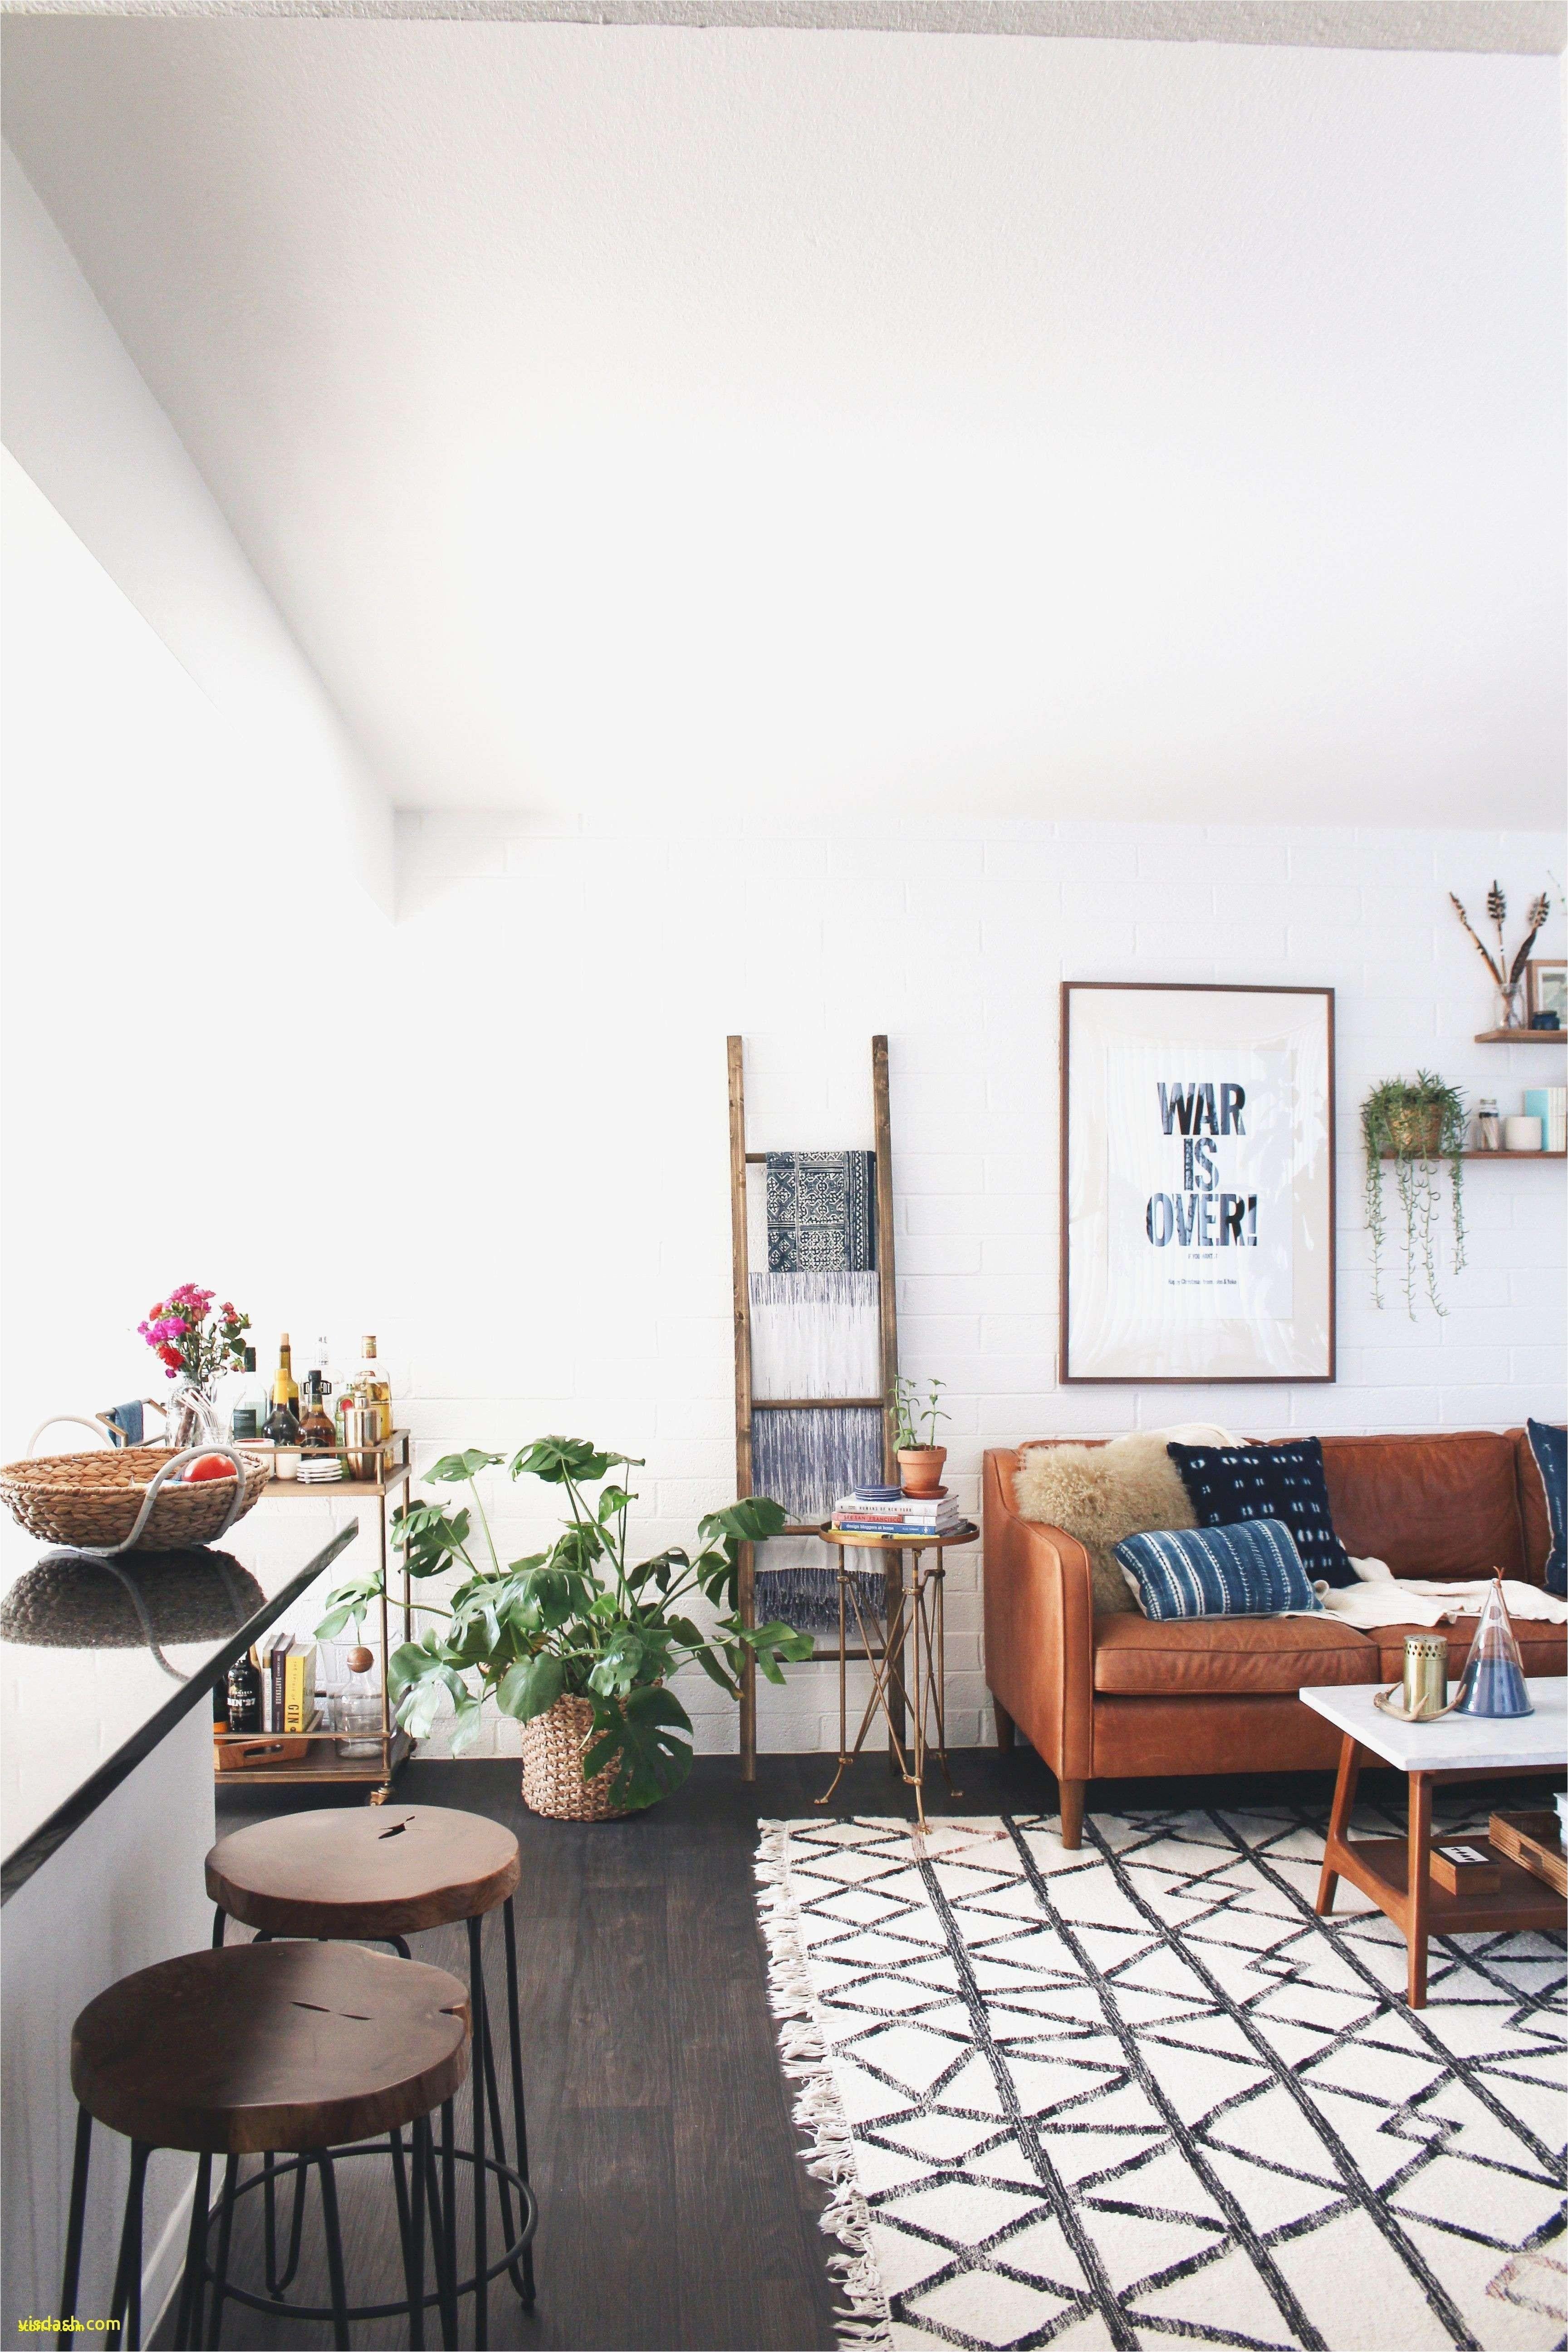 small house interior design ideas furniture pampa furniture pampa furniture 0d furnitures from home interior